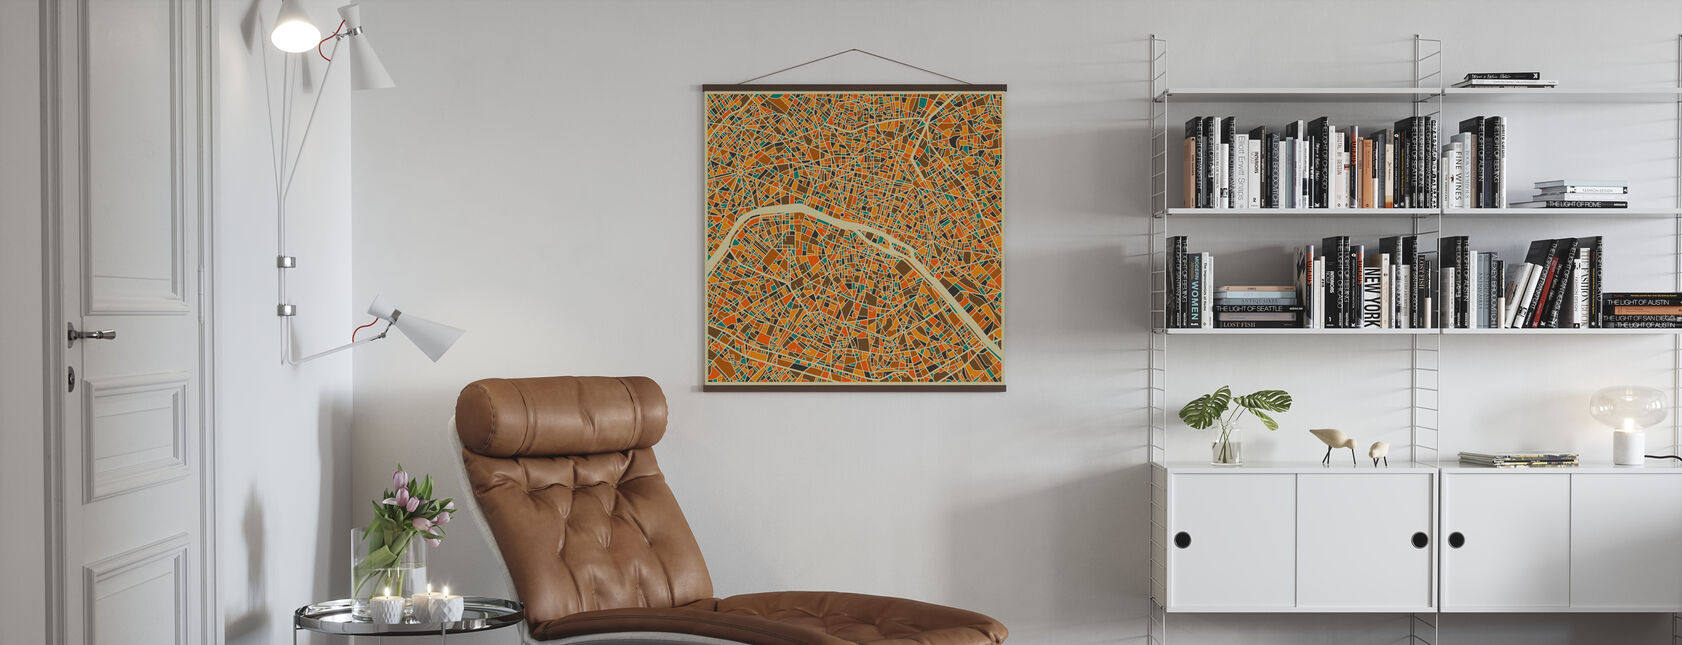 Multicolor Kaart - Parijs - Poster - Woonkamer